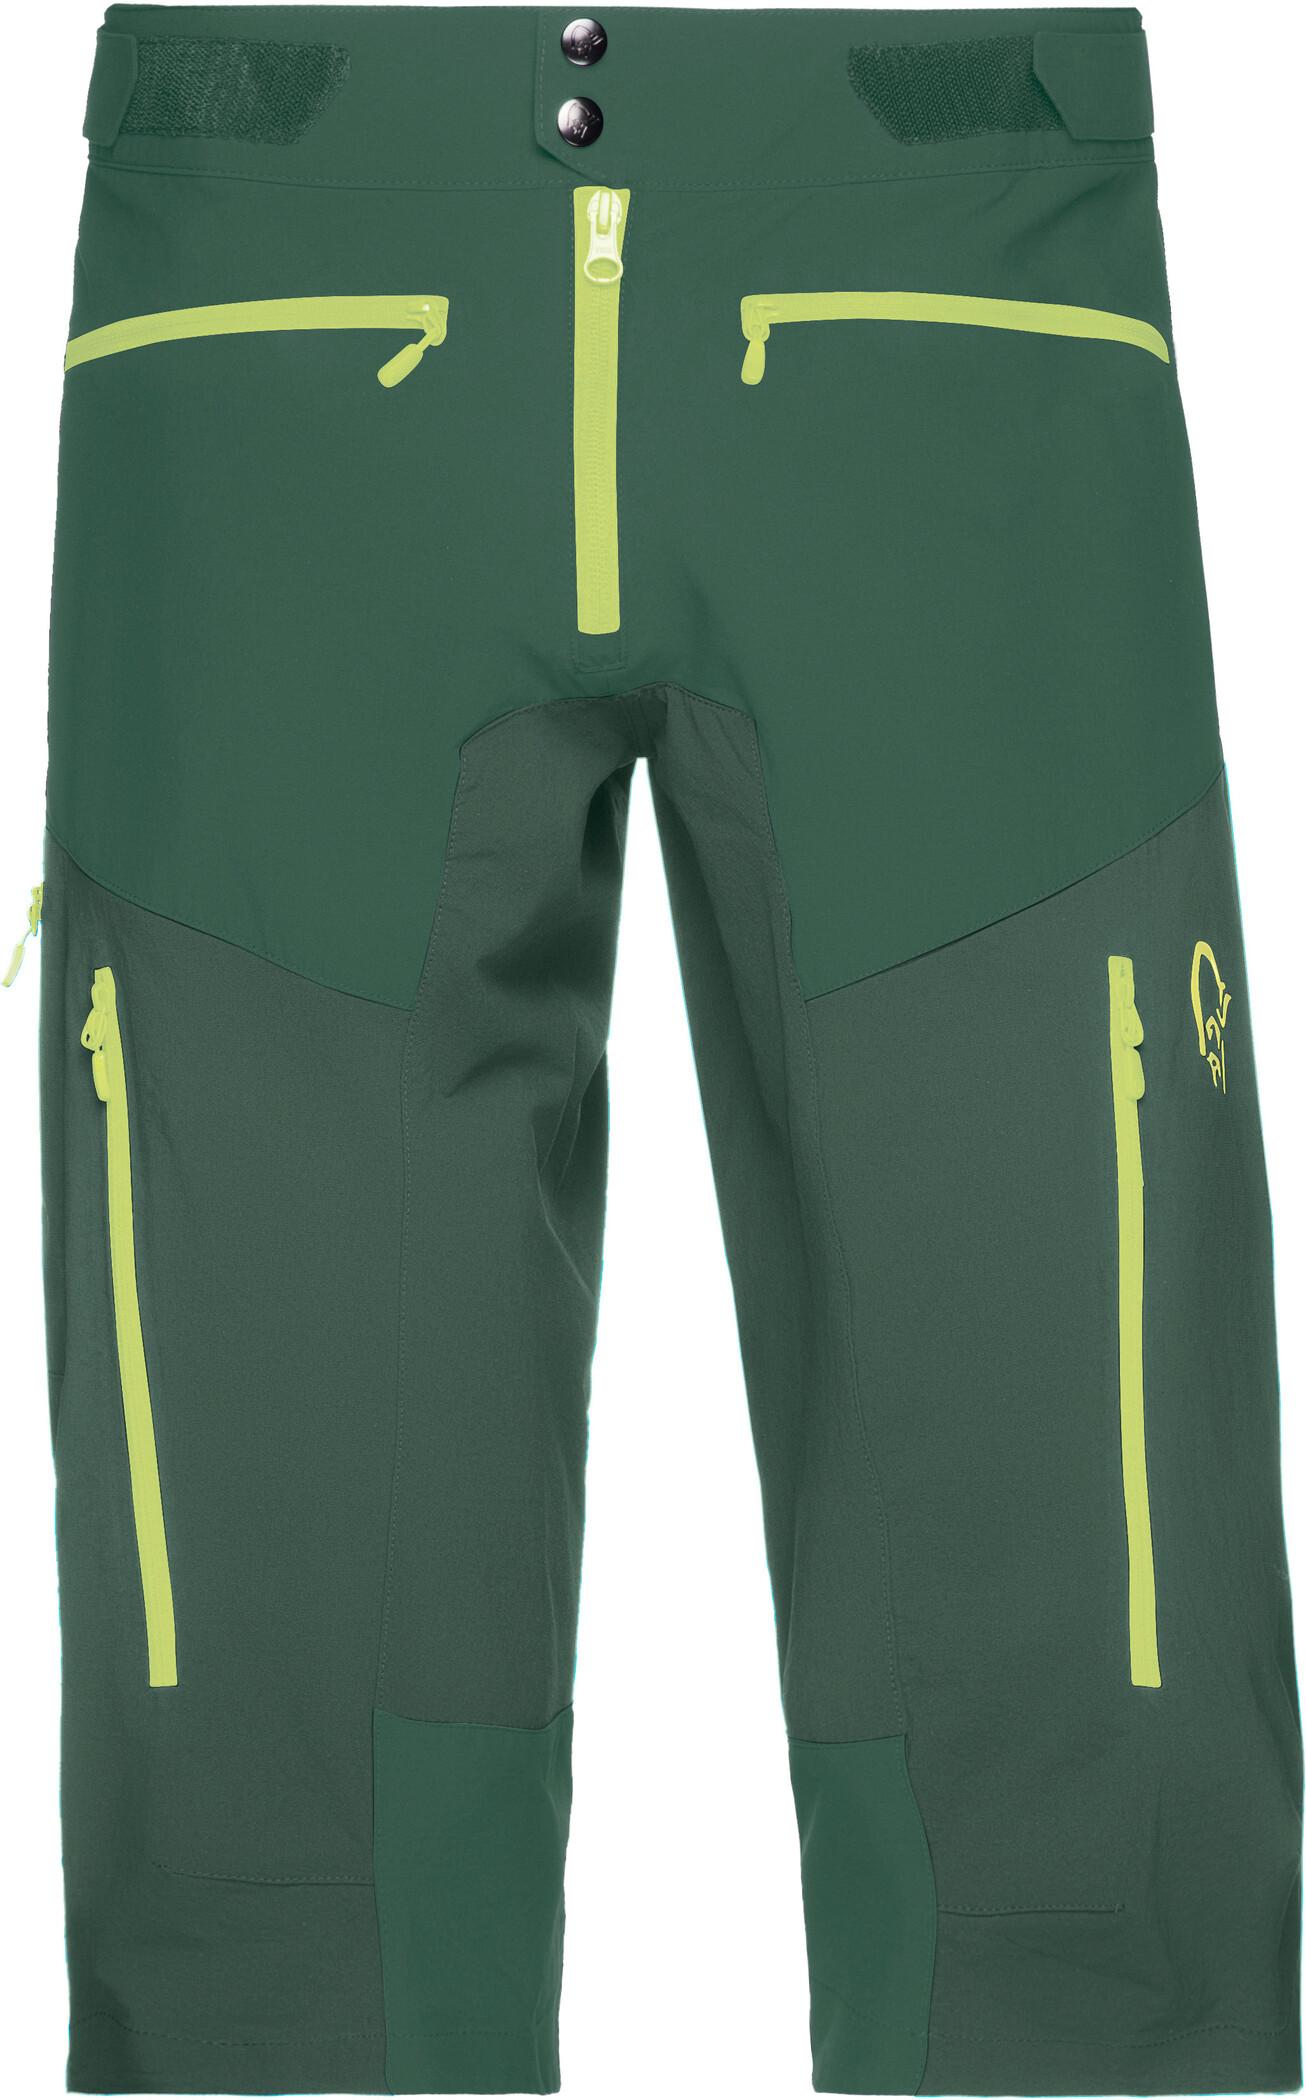 Norrøna Fjørå Flex1 Shorts Herrer, jungle green (2019)   Trousers